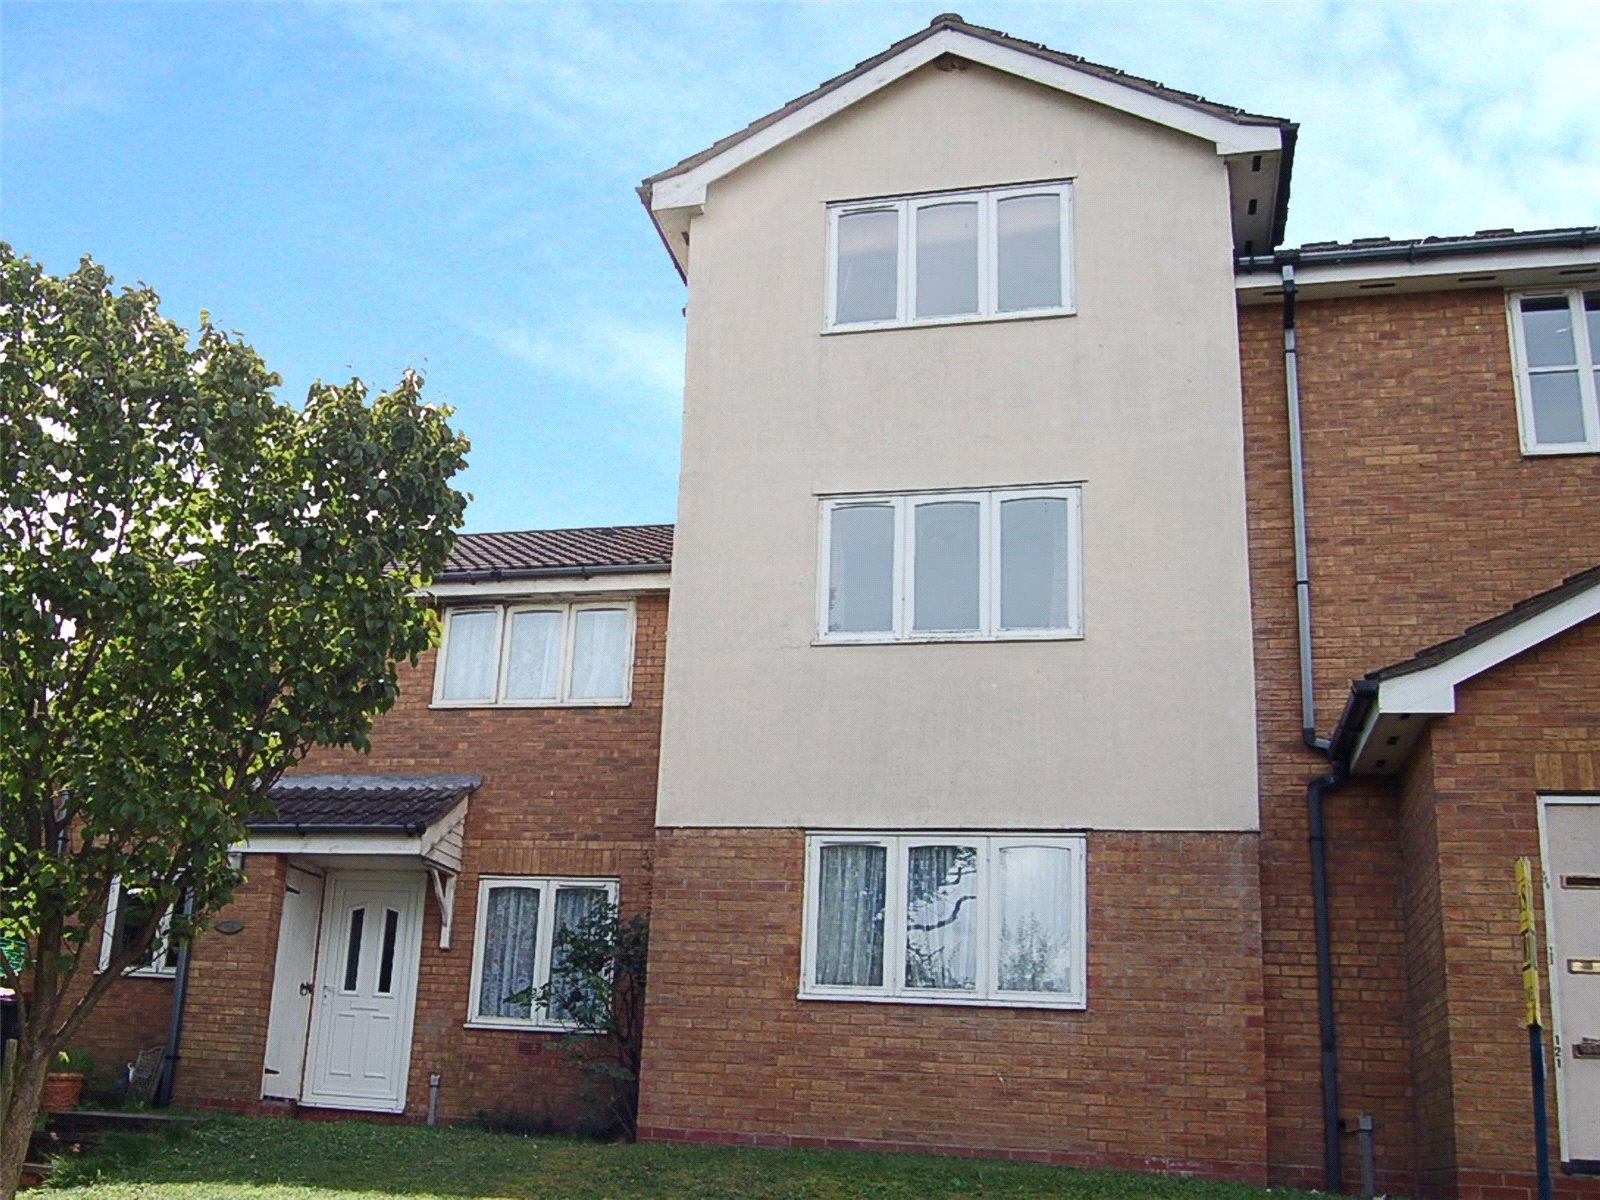 123 Charlecote Park, Telford, Shropshire, TF3